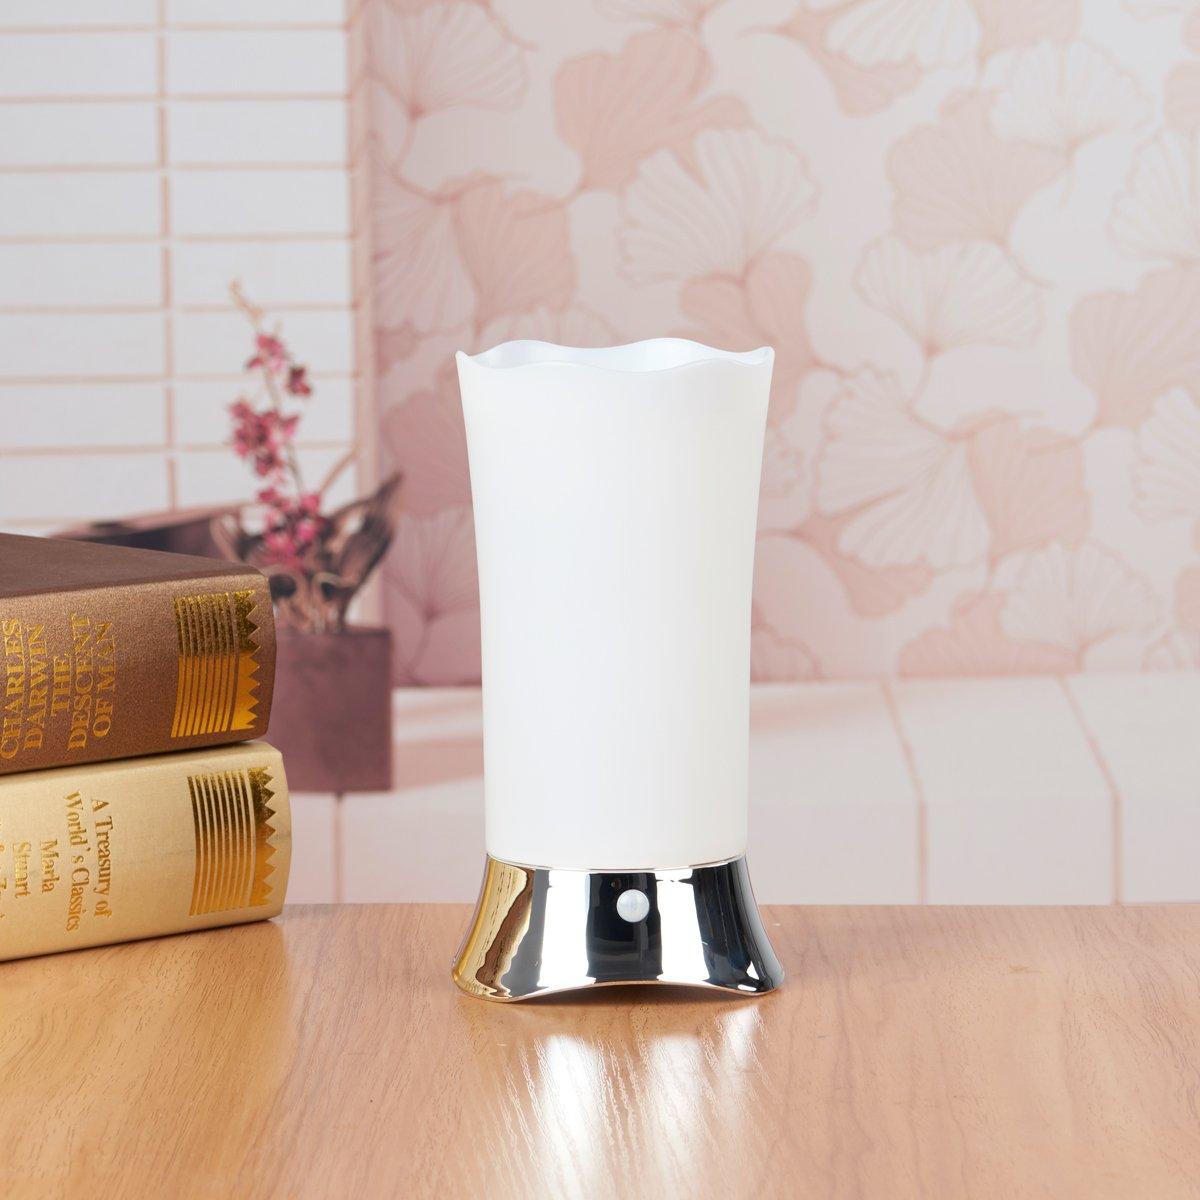 Zeefo Table Lamps Indoor Motion Sensor Led Night Light